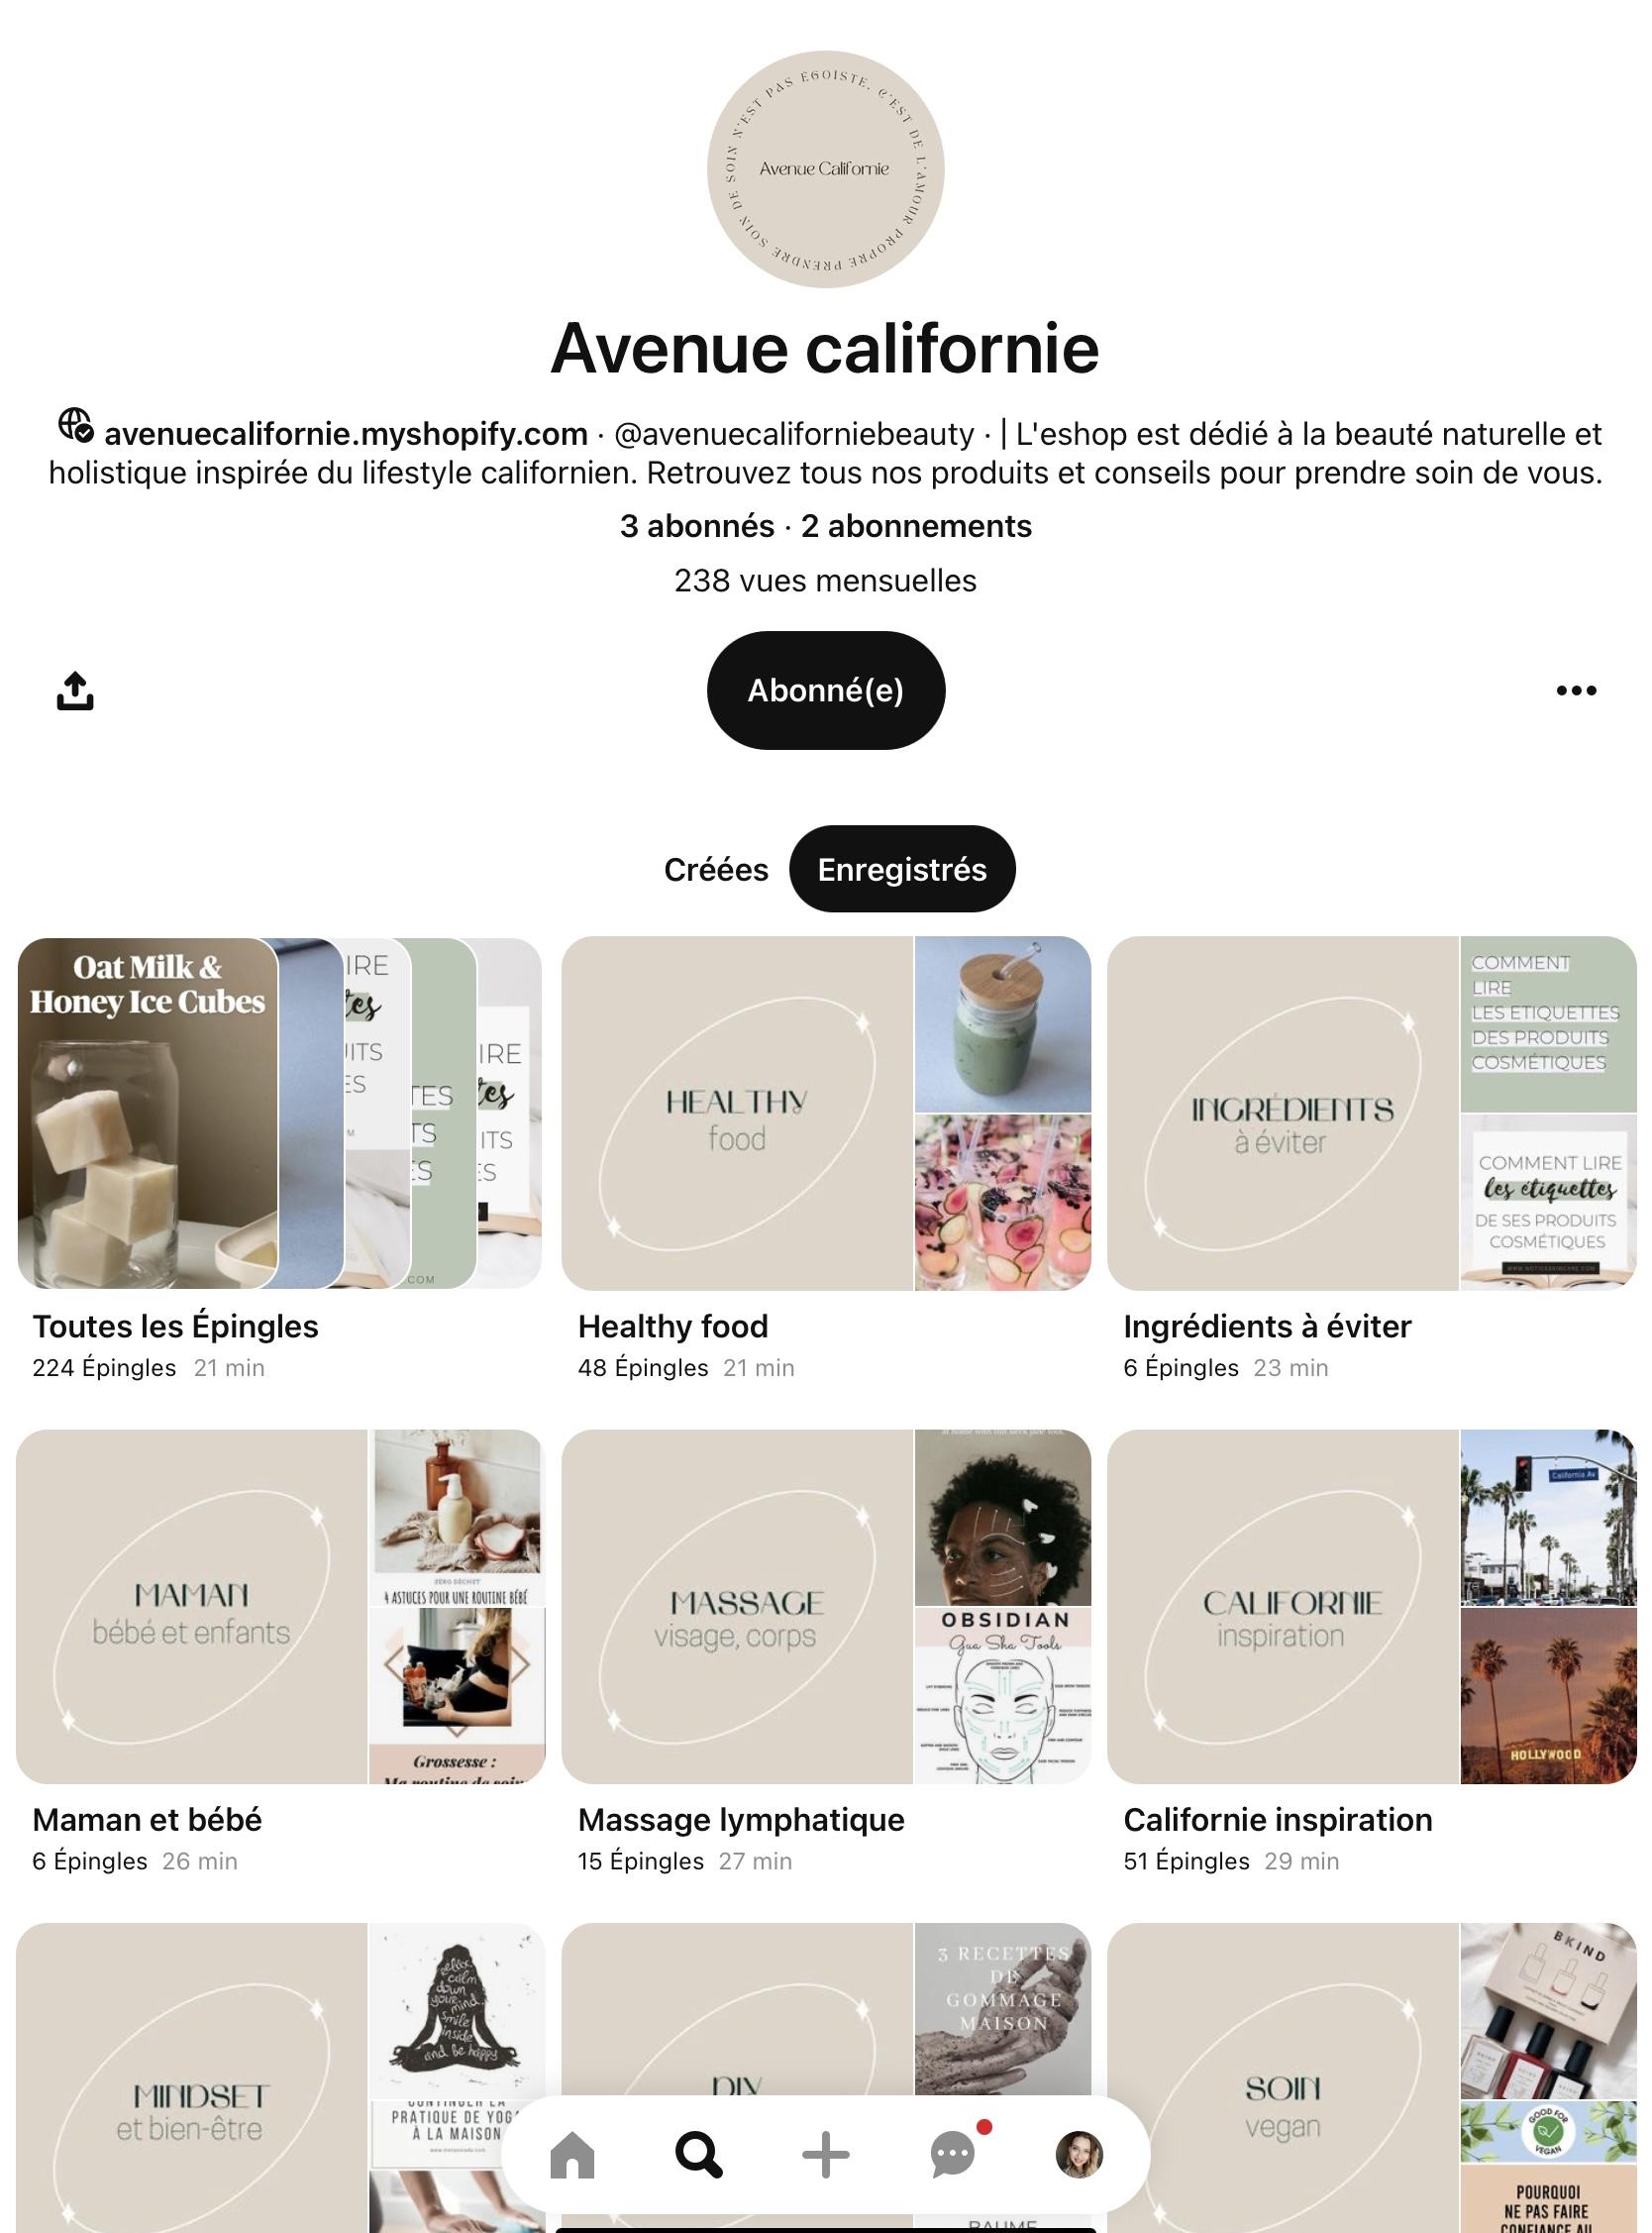 Pimp ton Pinterest - Avenu californie